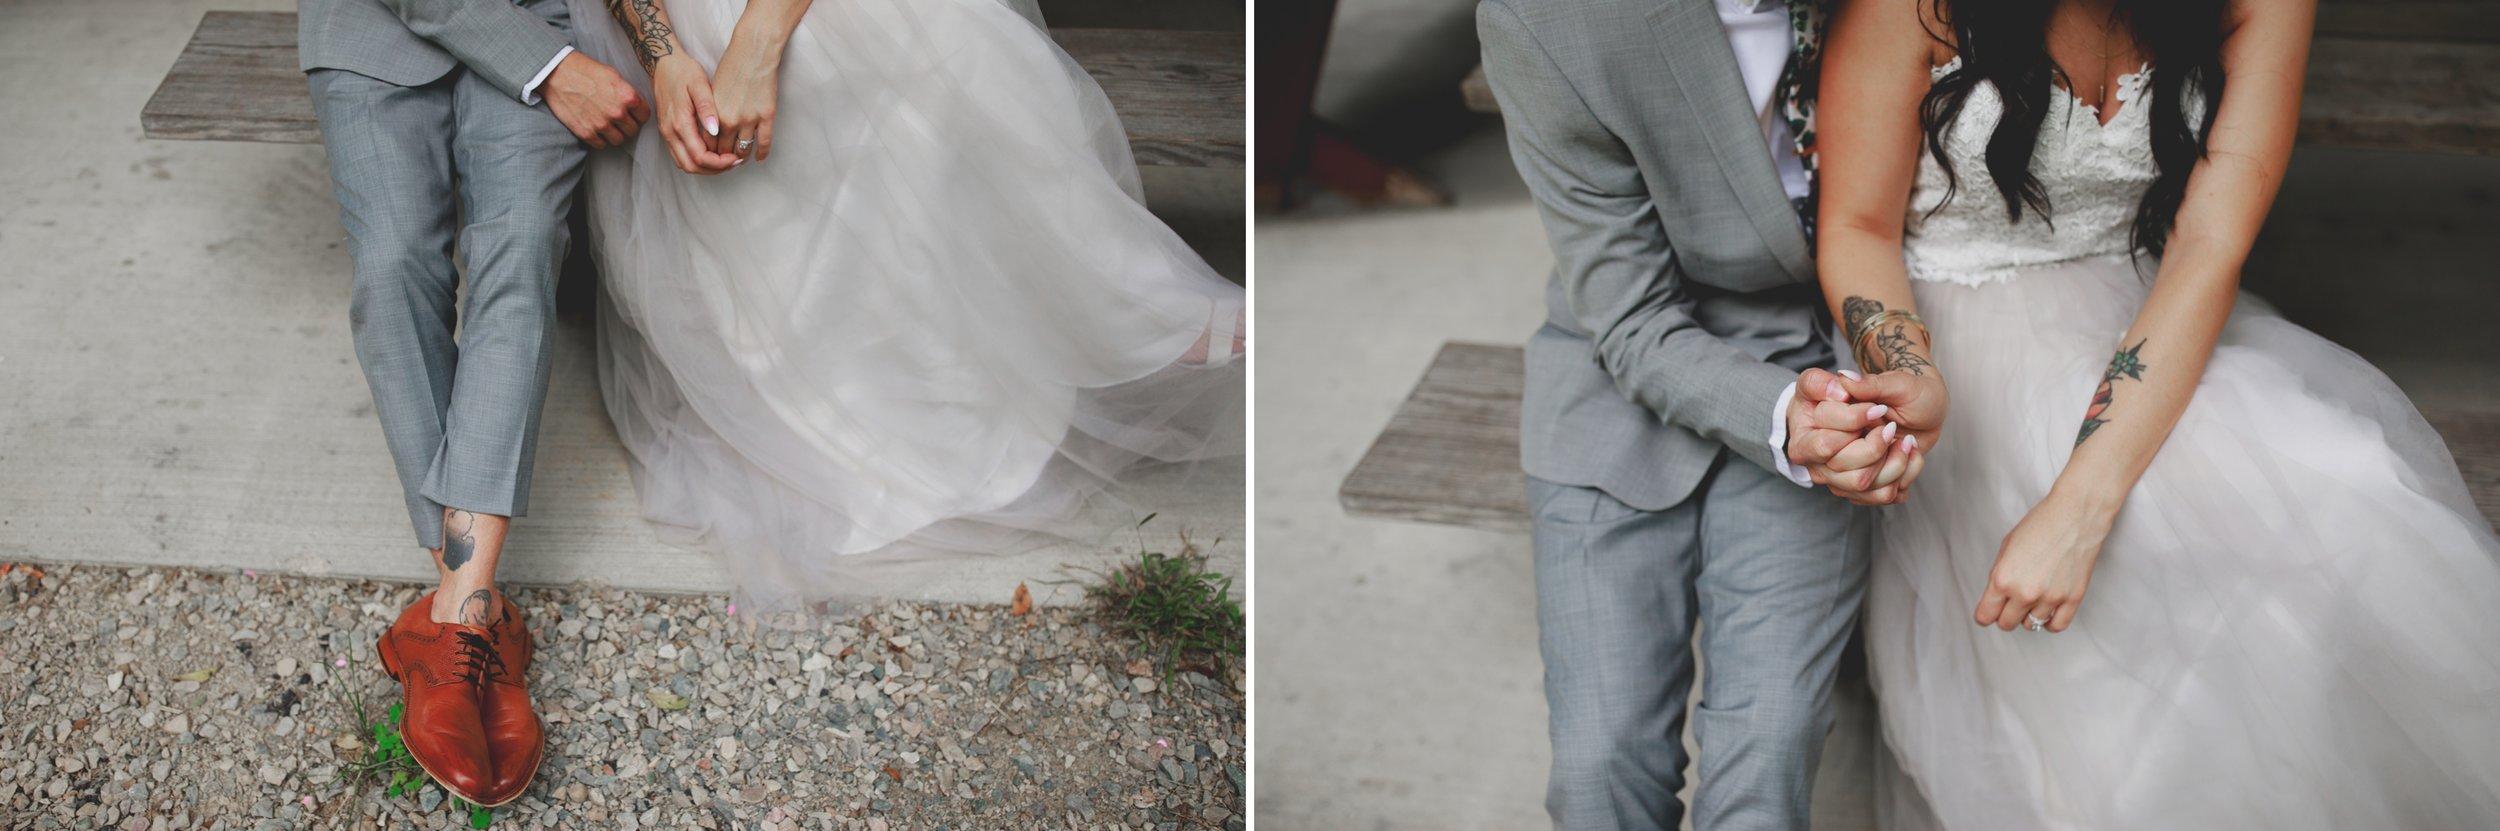 amanda_vanvels_michigan_camp_wedding_049.jpg